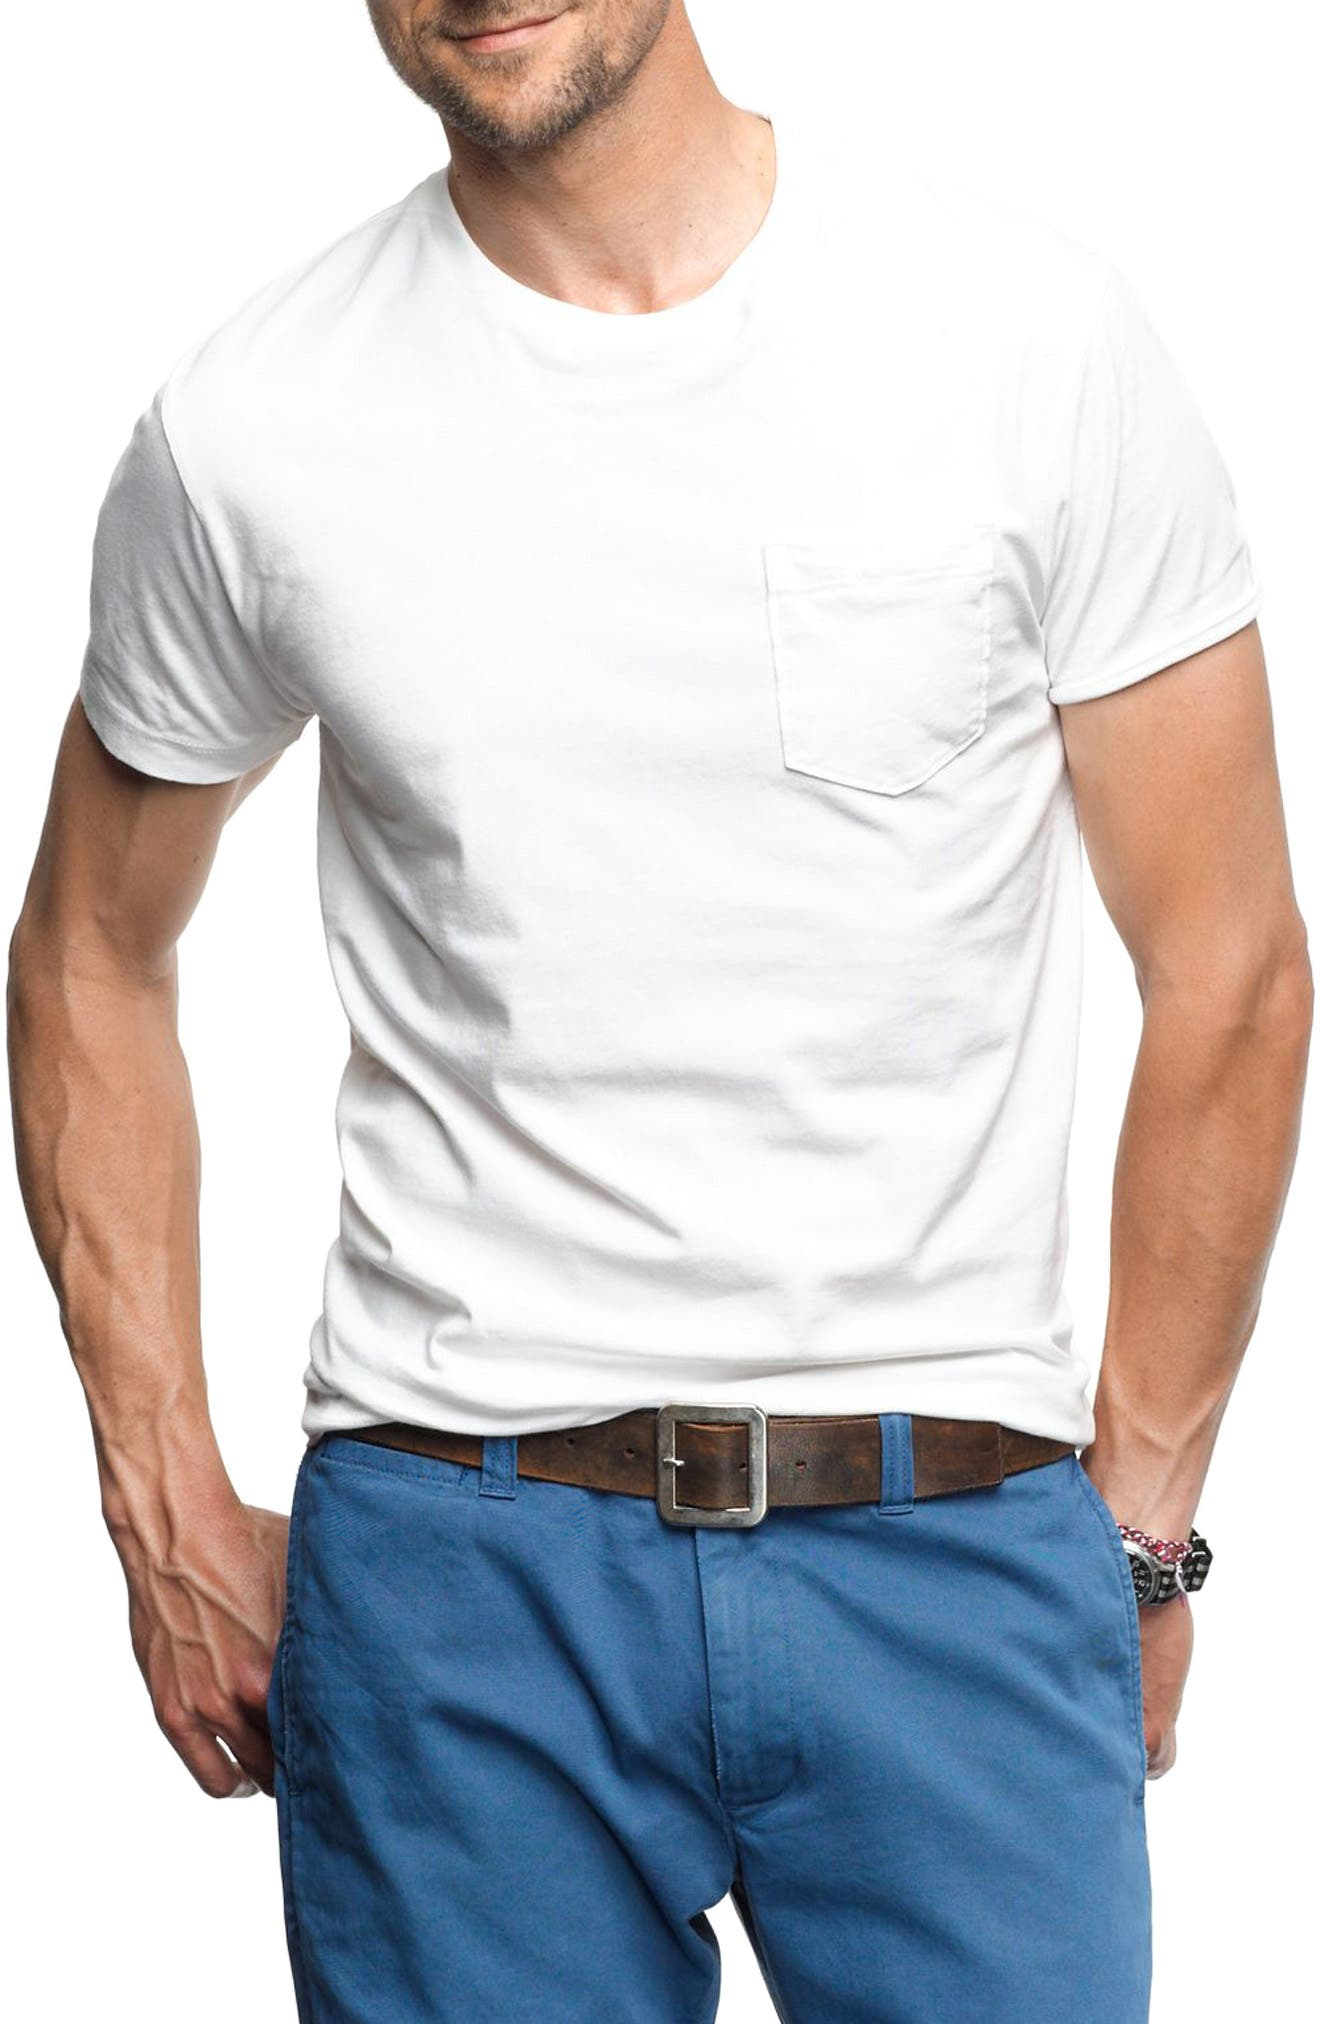 Alternate Image 1 Selected - J.Crew Slim Fit Broken-In Pocket T-Shirt